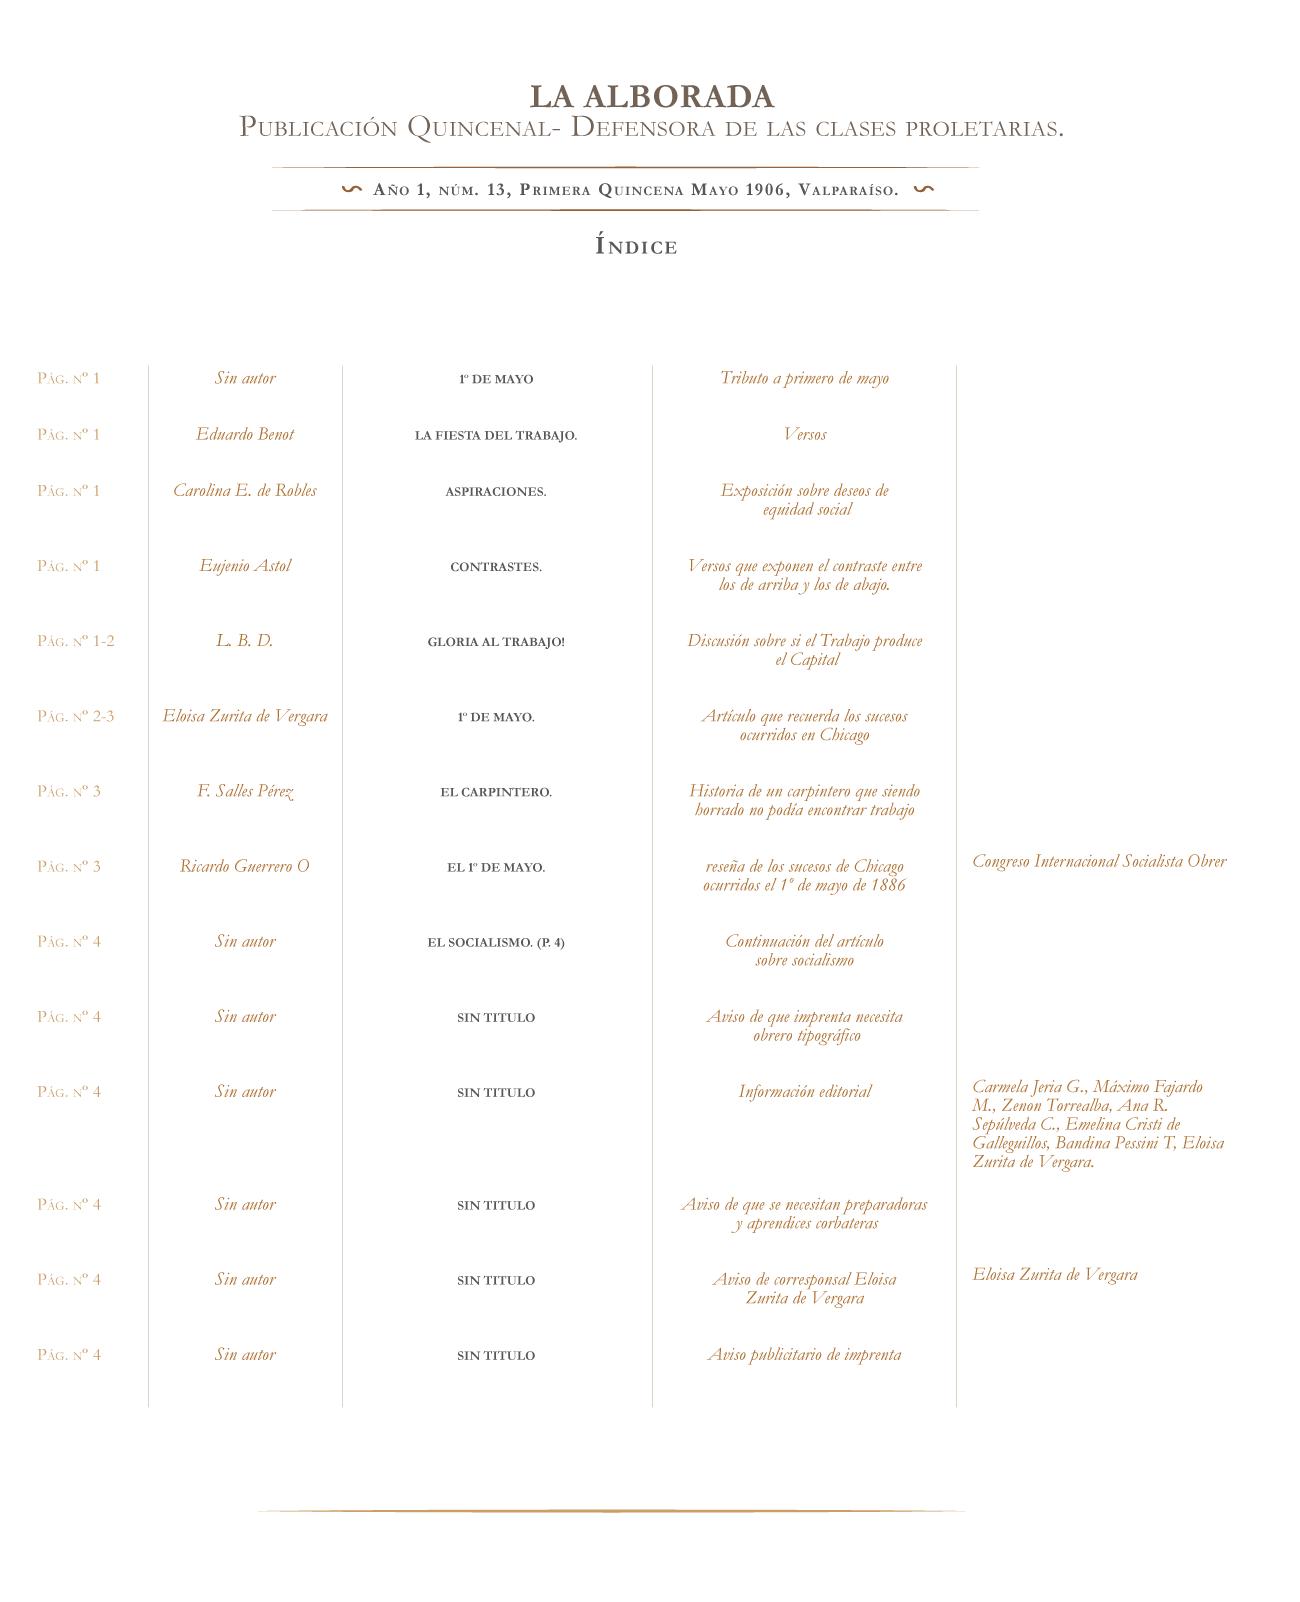 La Alborada nº 13